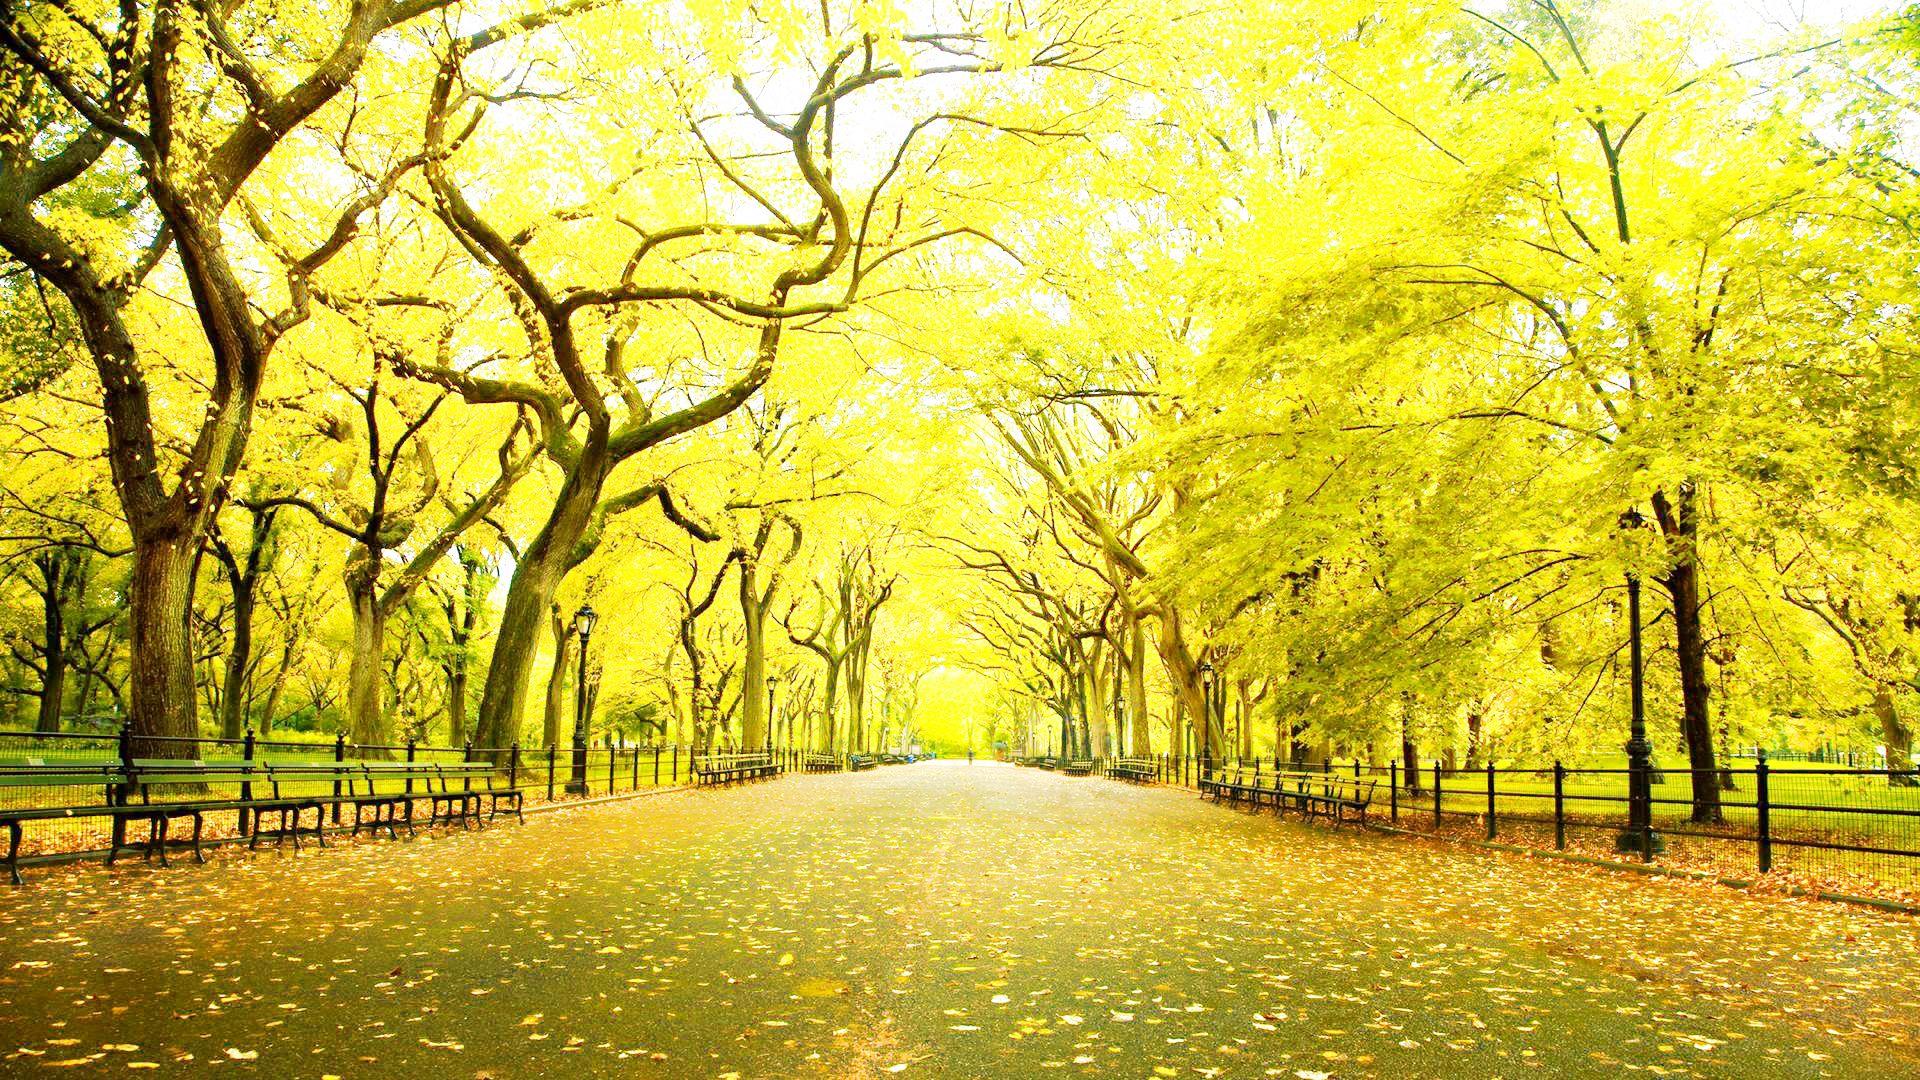 Wallpaper Hd 1080p Free Download - New York Central Park Autumn - HD Wallpaper